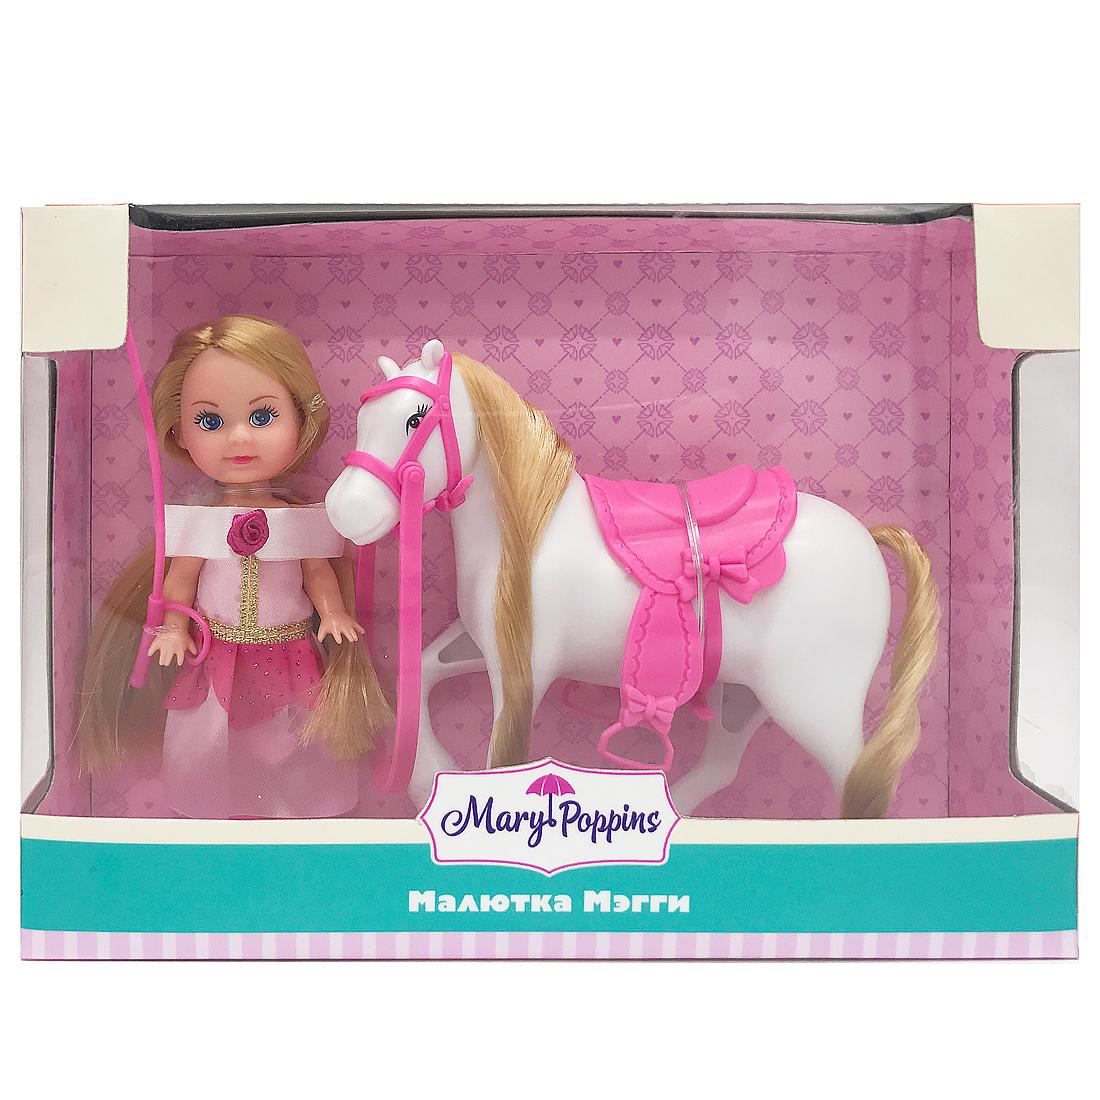 Другие куклы Mary Poppins Малютка Мэгги: Любимая лошадка все цены